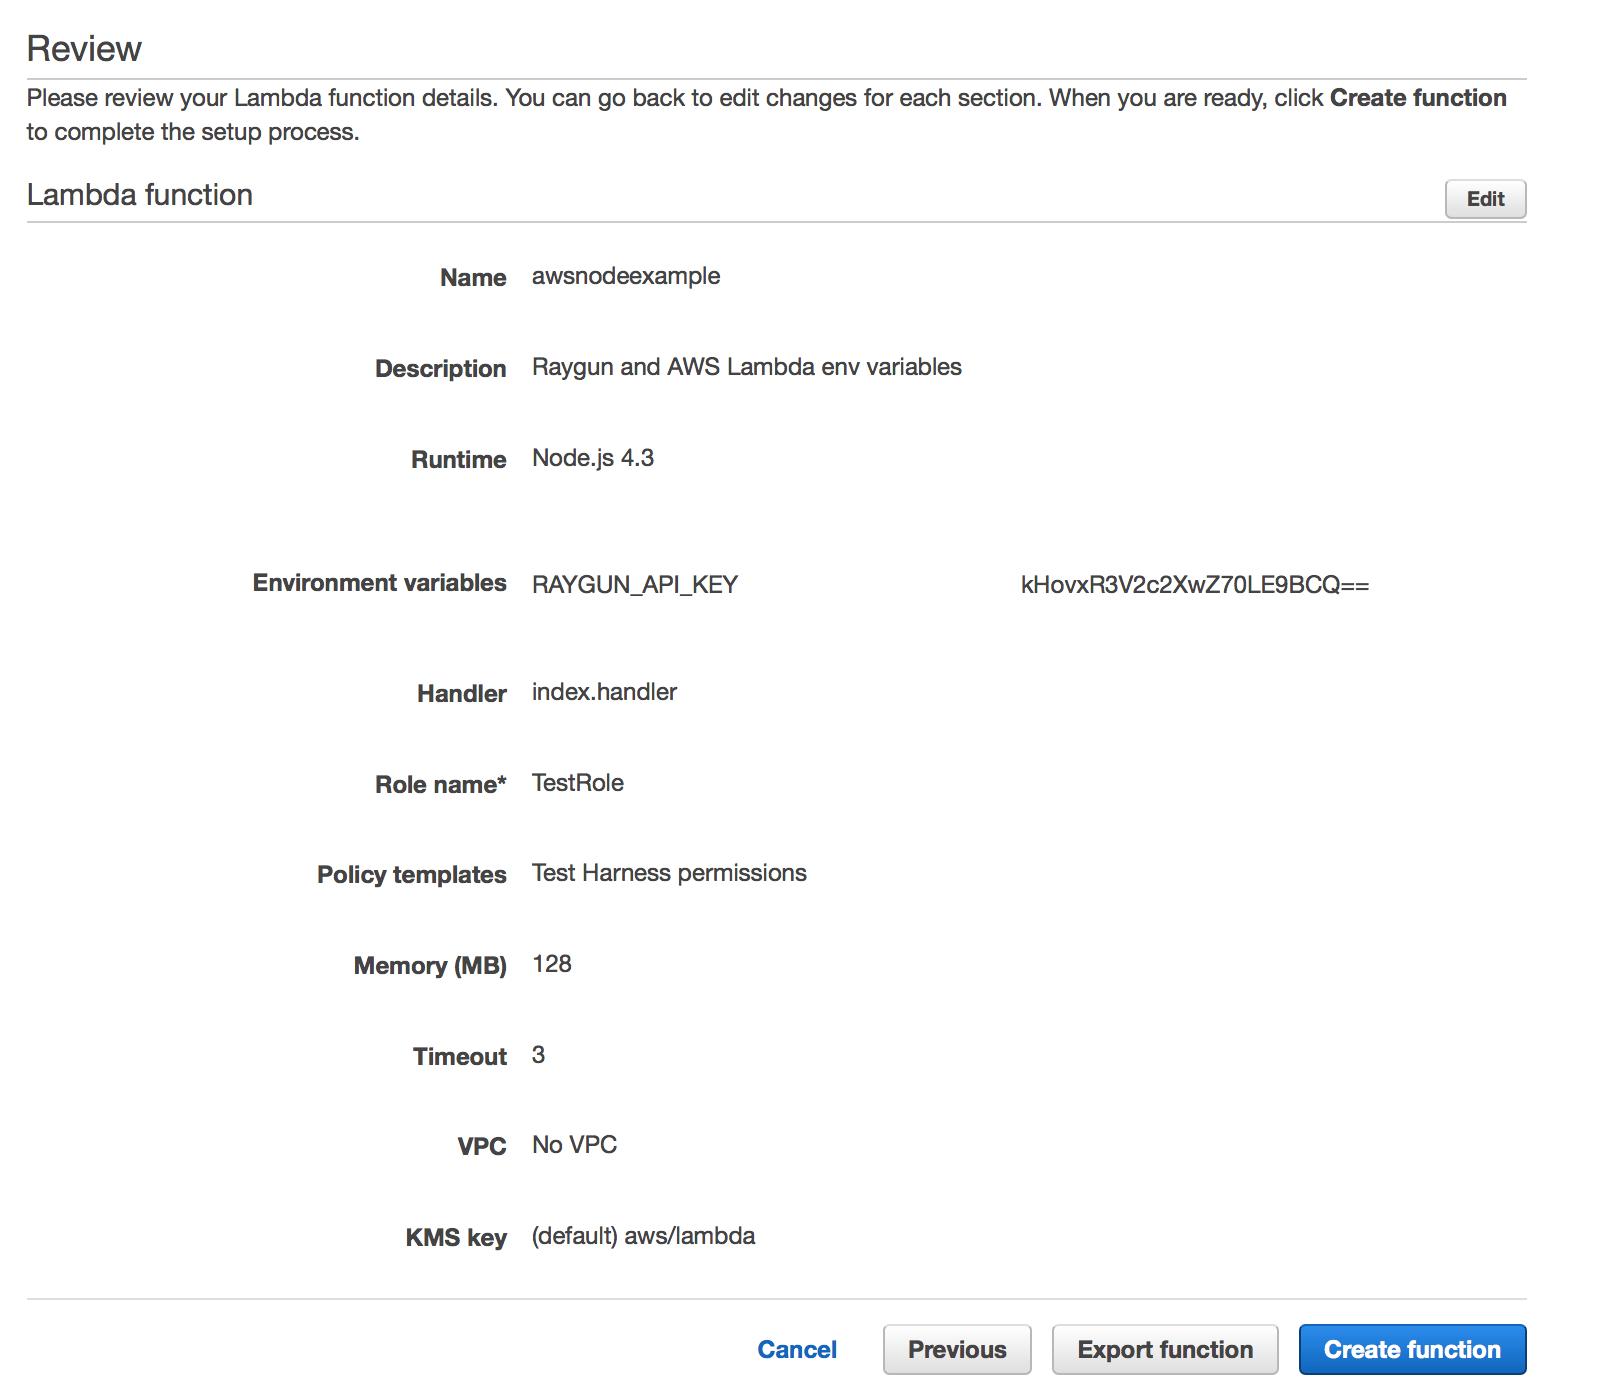 aws lambda review function